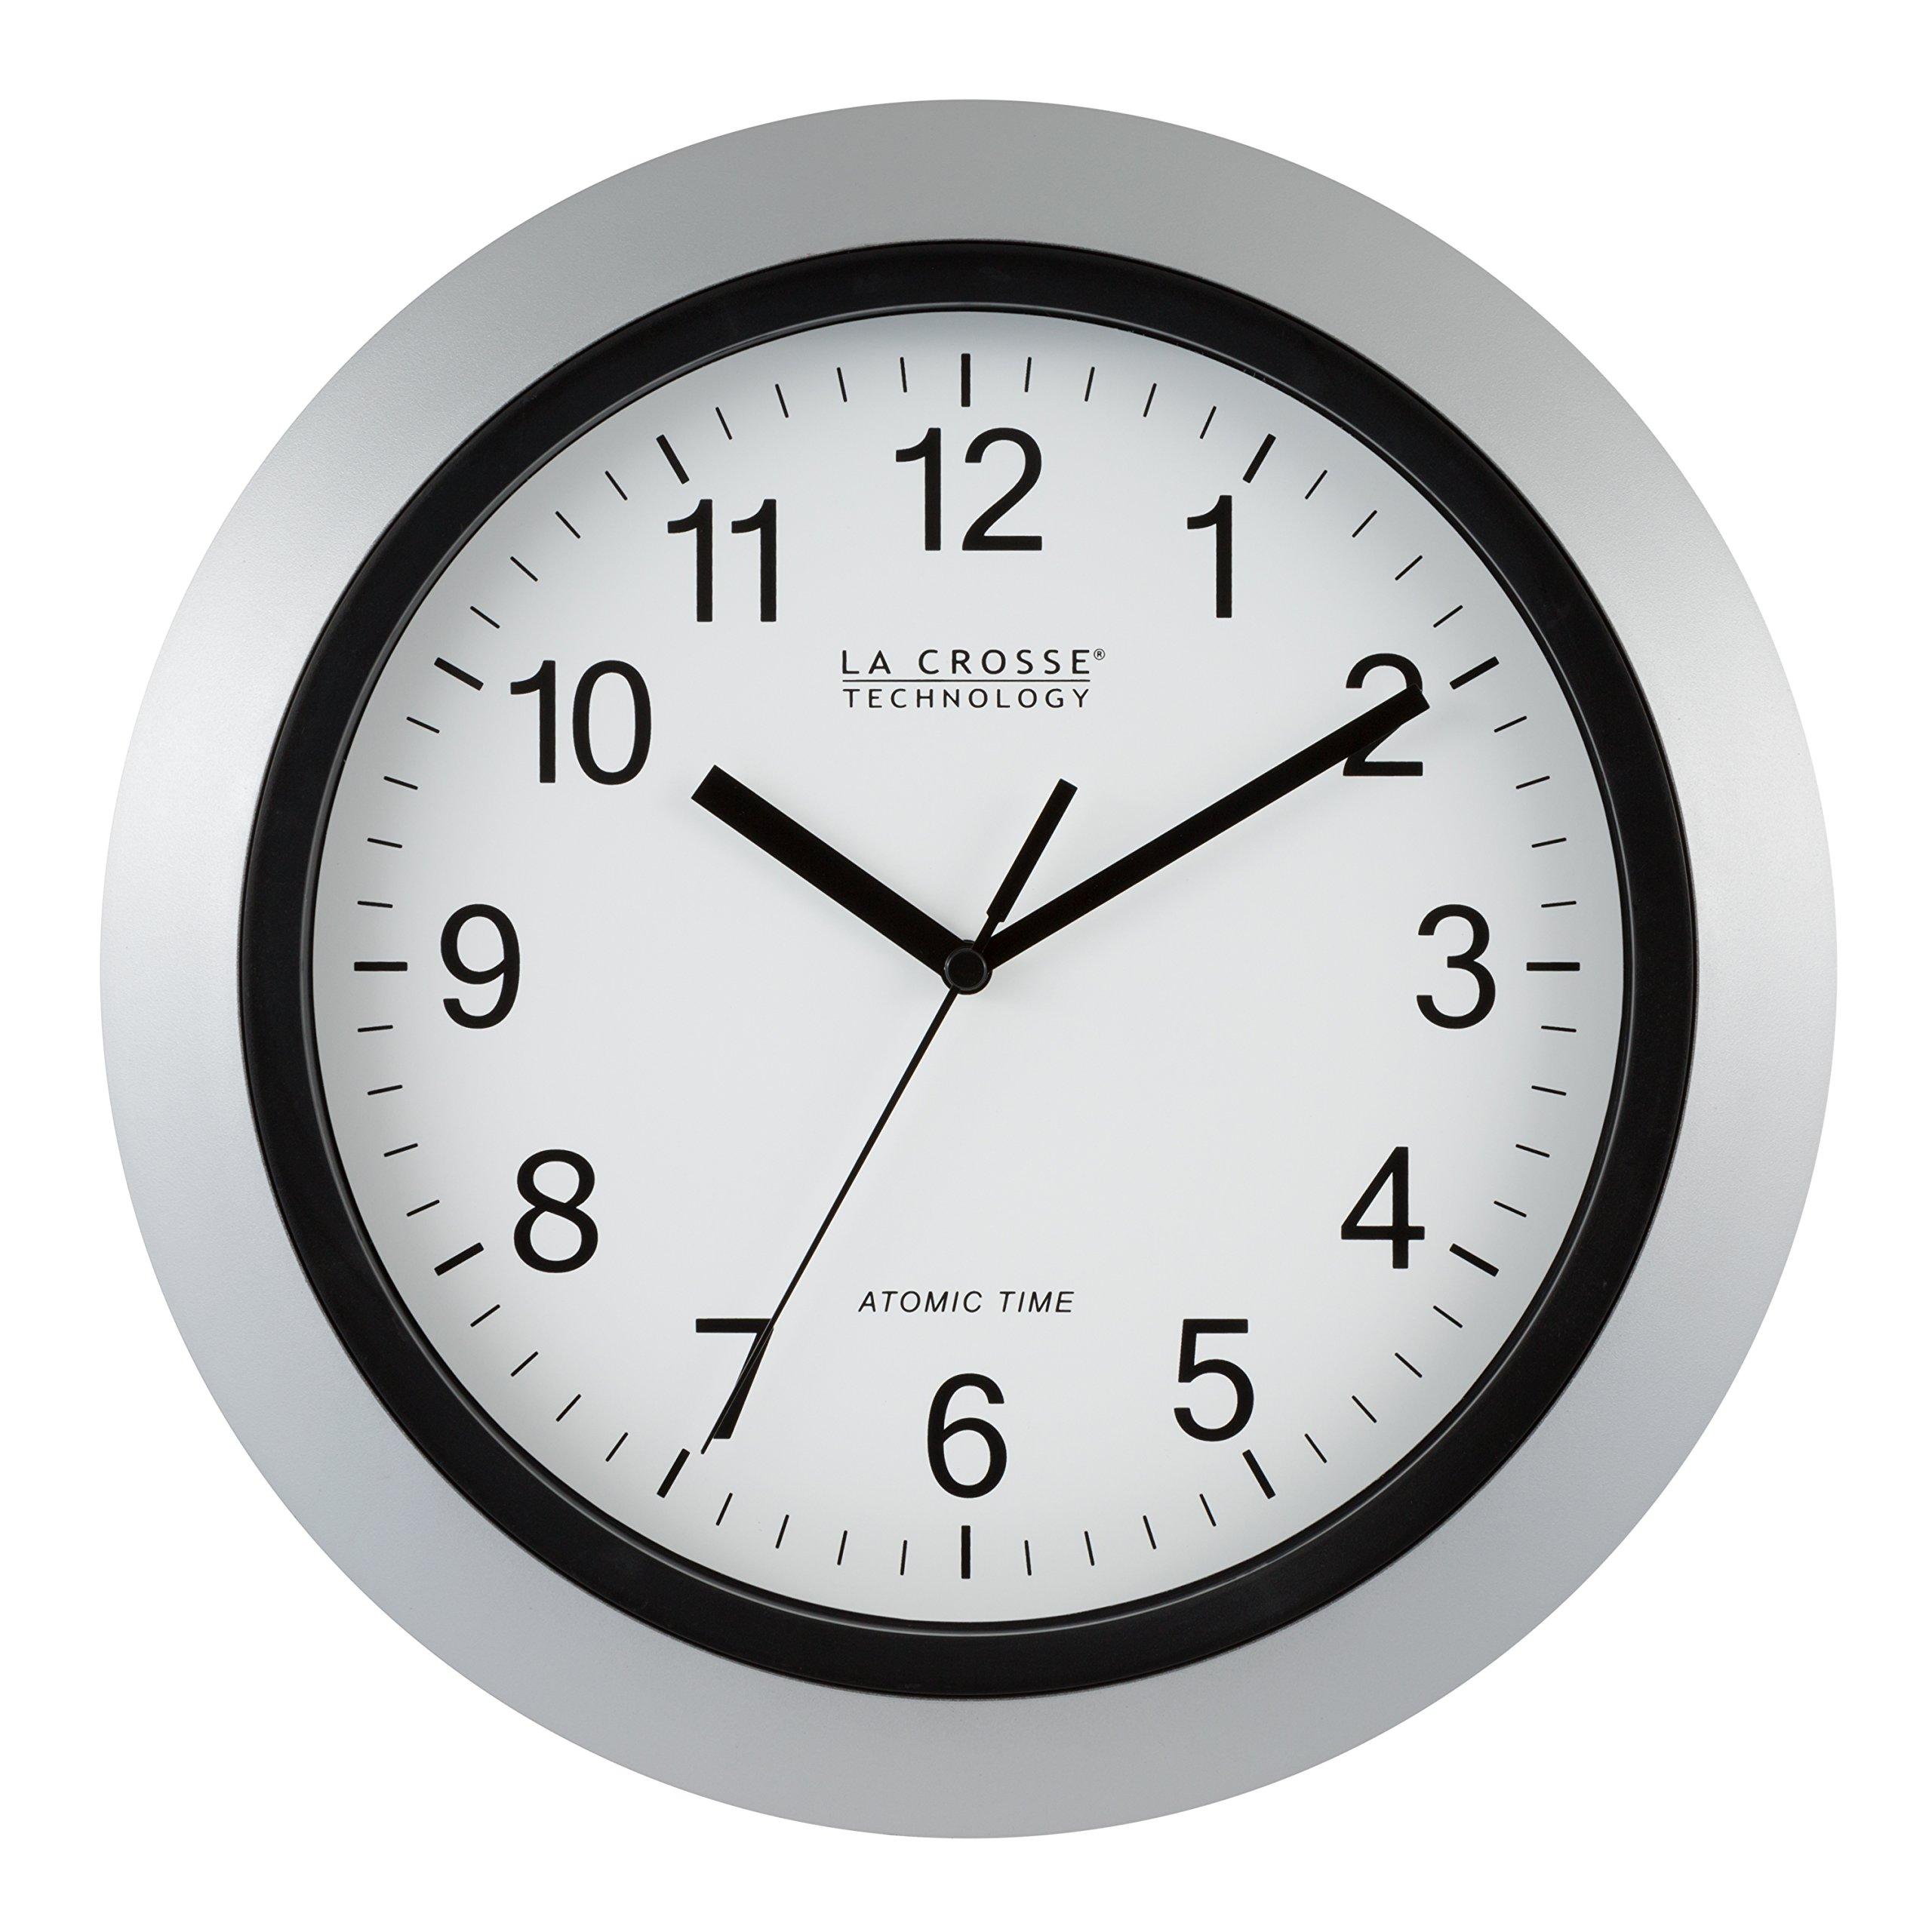 La Crosse Technology WT-3129S Atomic Analog Wall Clock, 12'', Silver